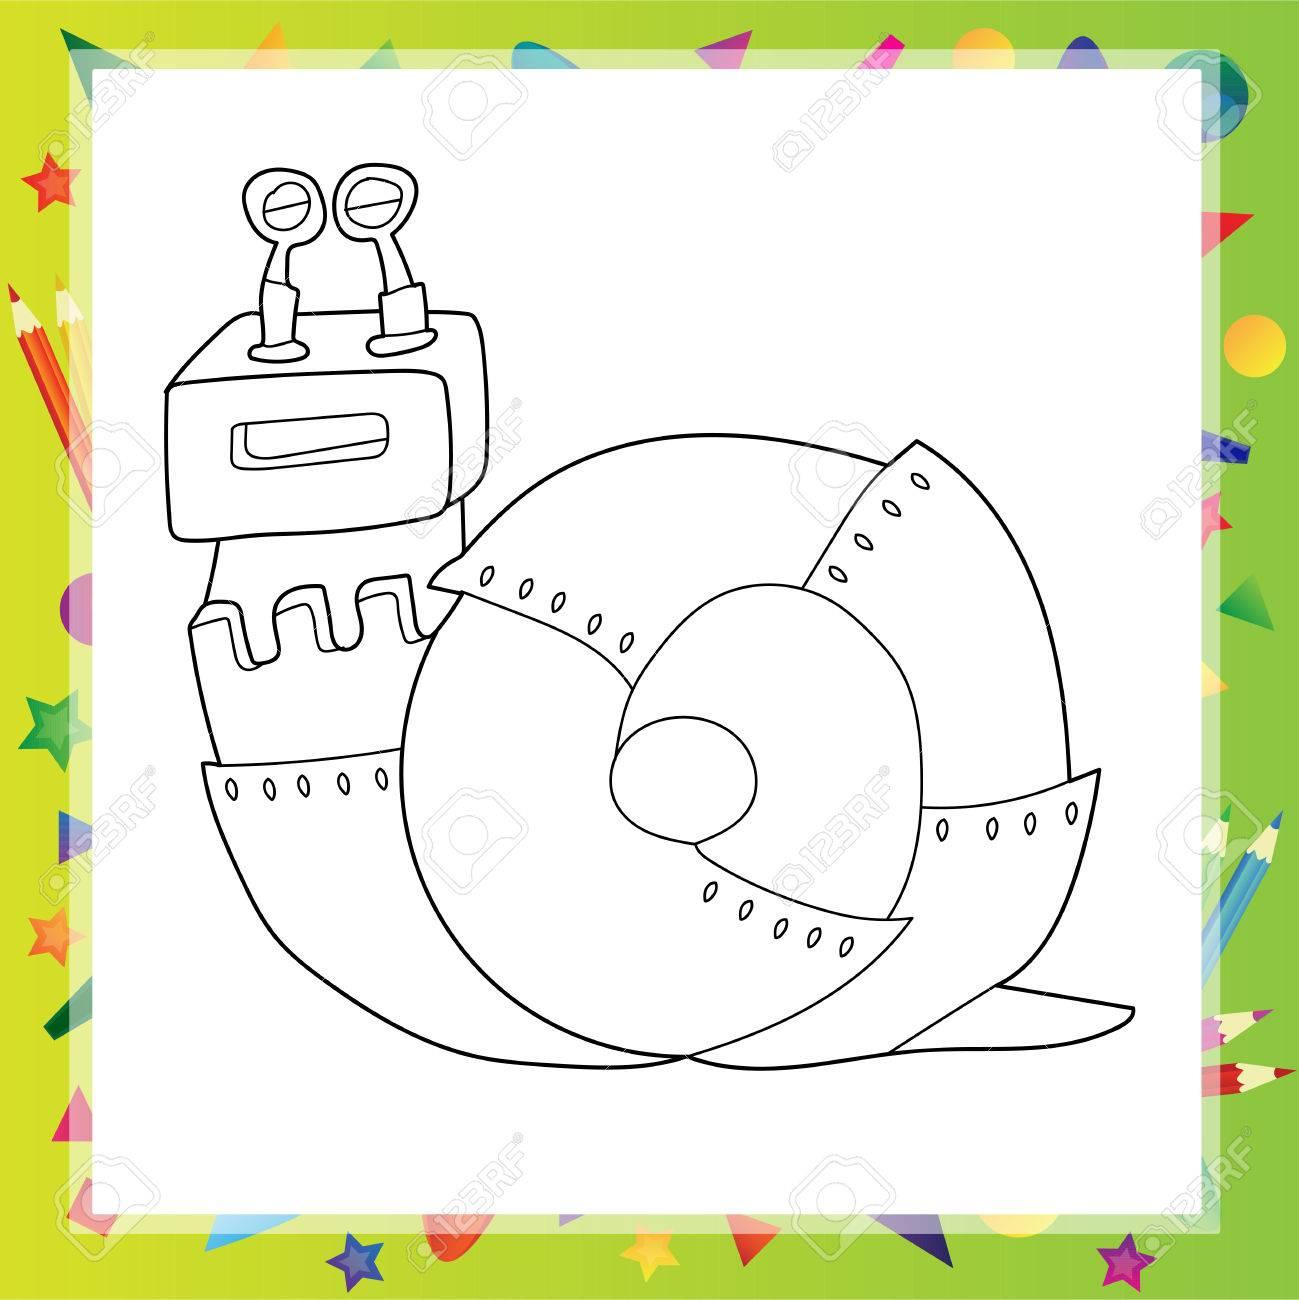 Ilustración Vectorial De Dibujos Animados De Caracol Robot Libro Para Colorear